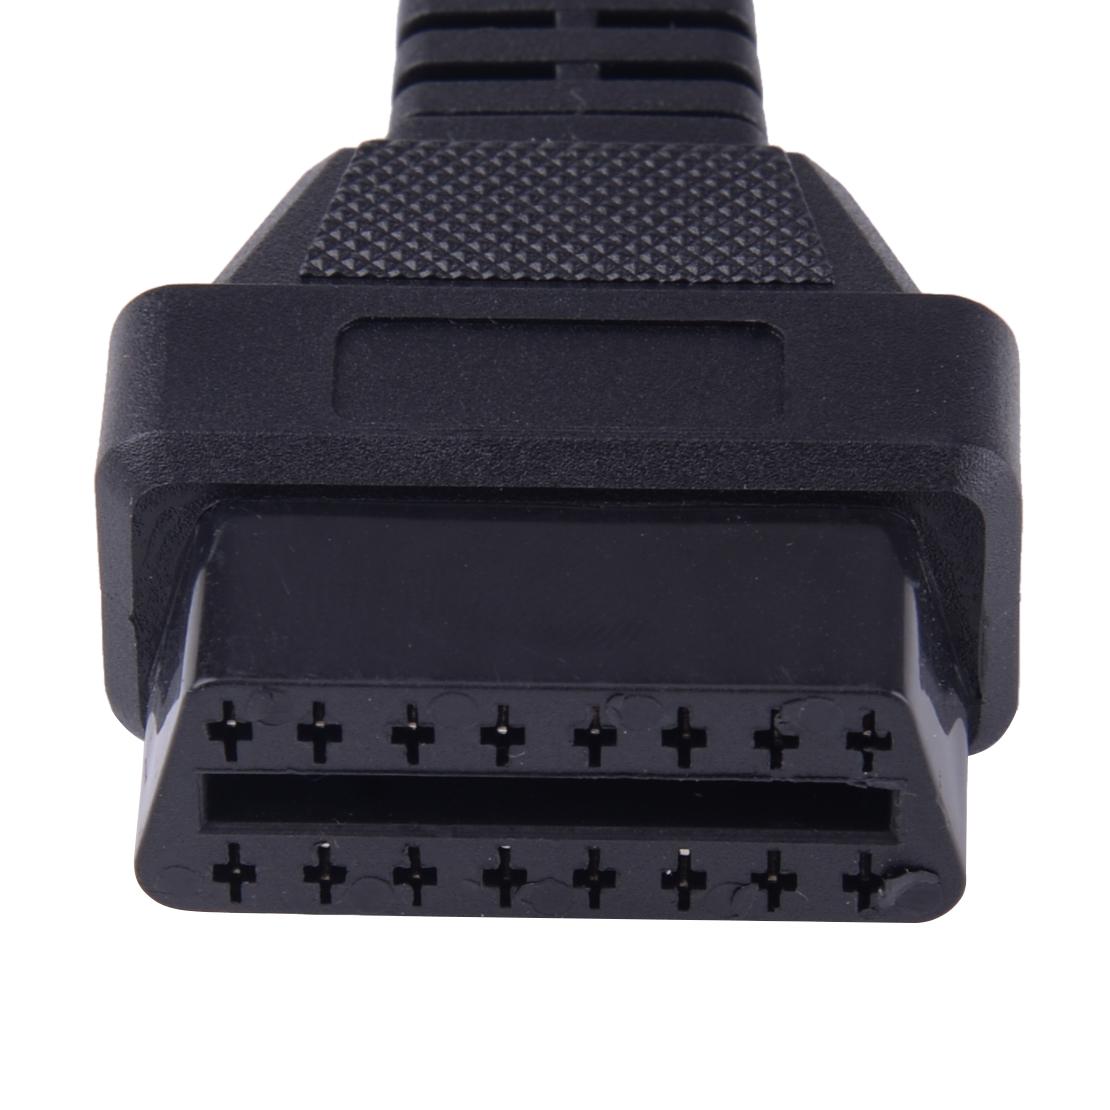 Obd1 9pin obd2 16pin Stecker Adapter Diagnose Kabel passend für Subaru schwarz